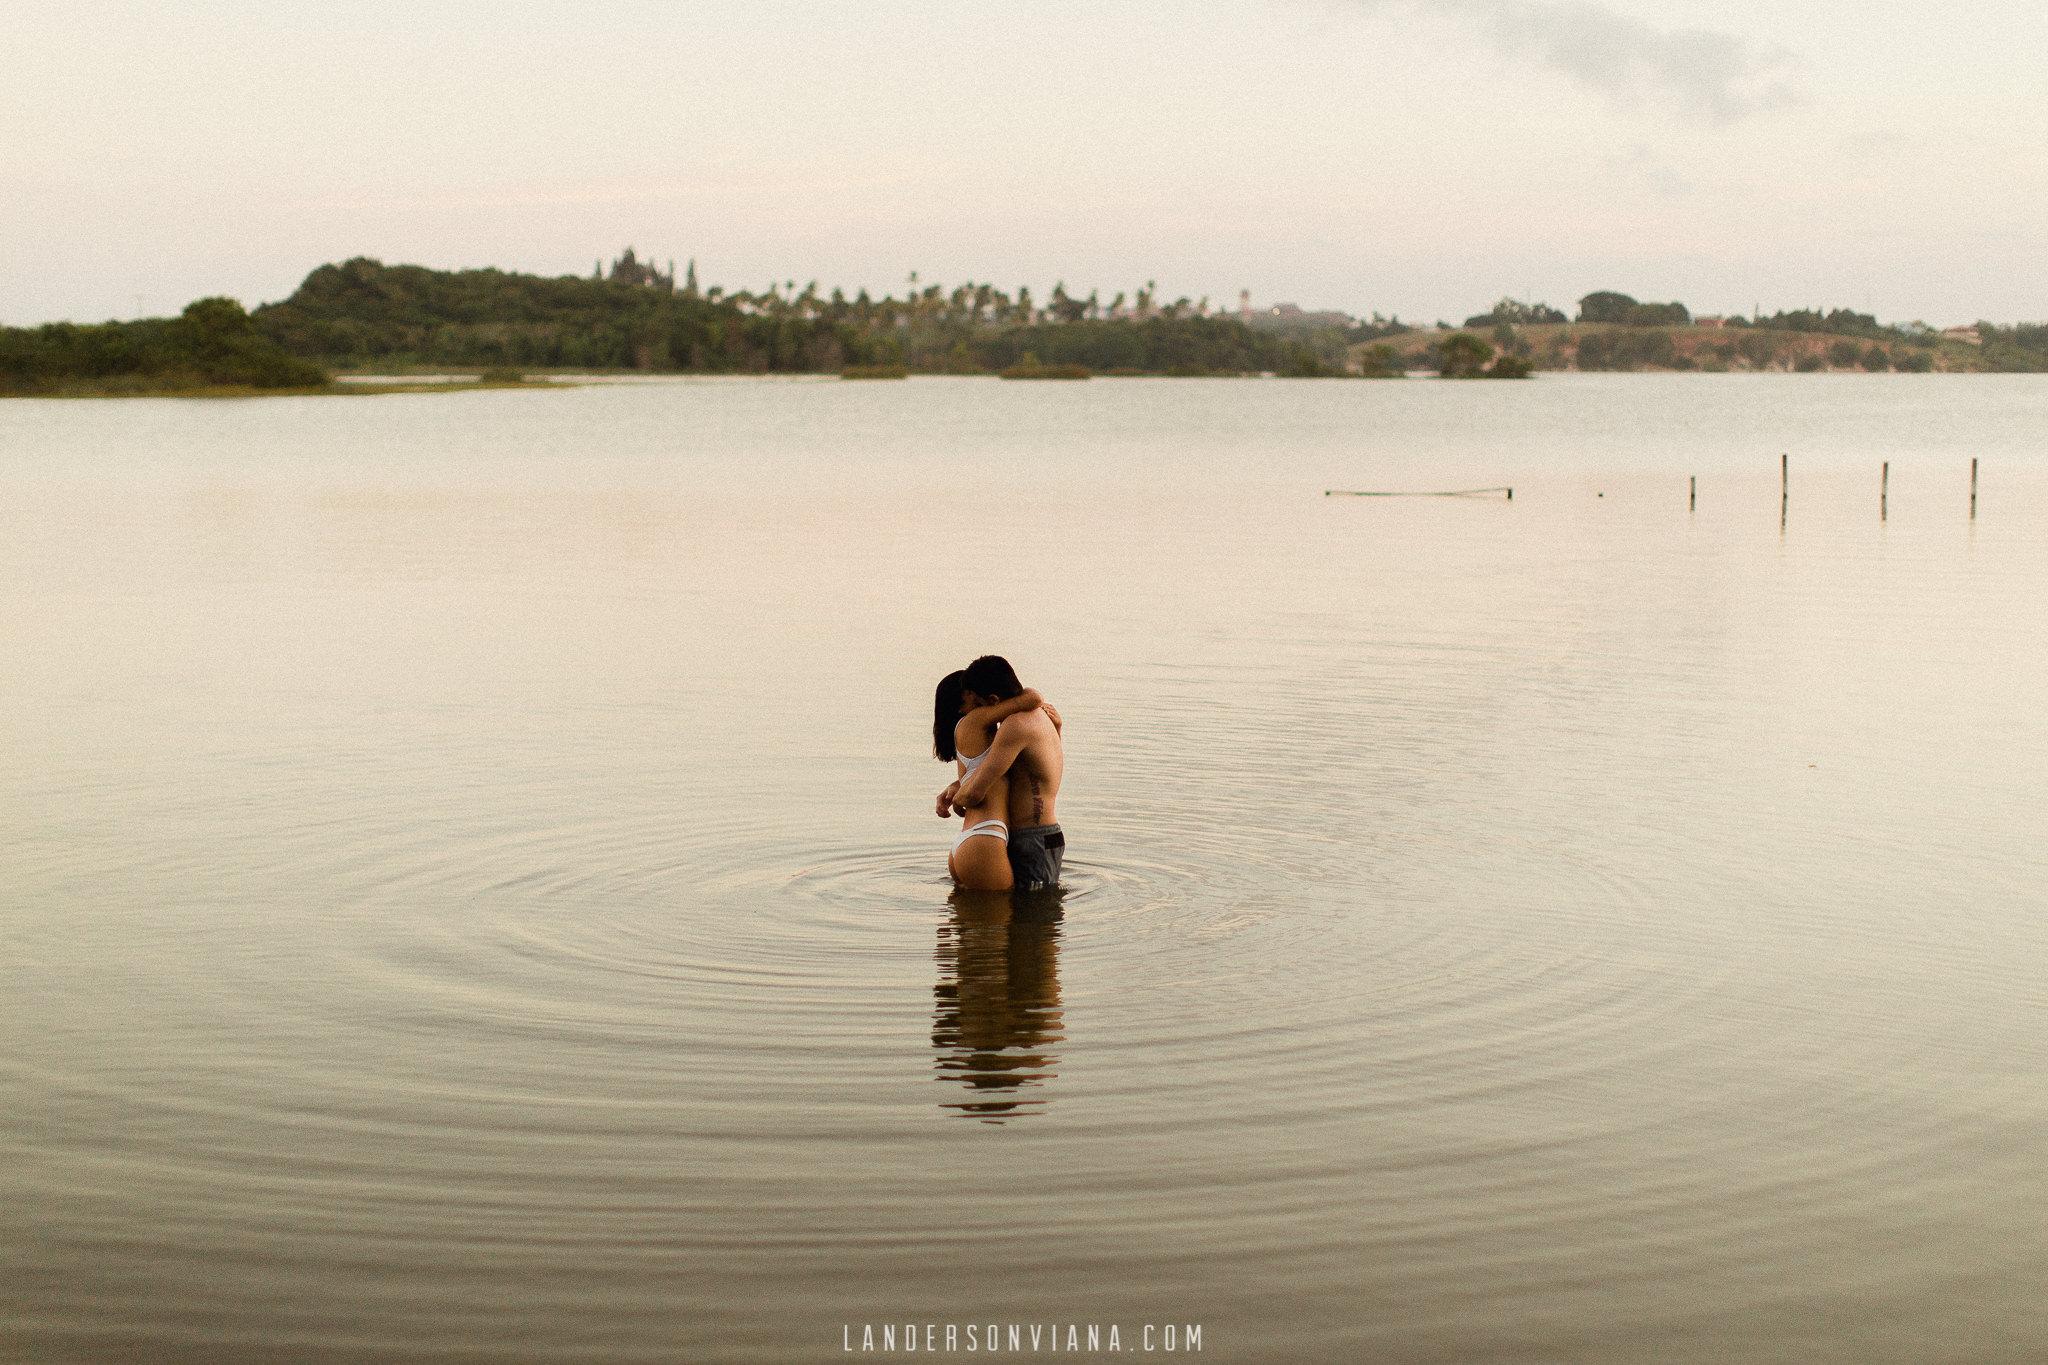 ensaio-pre-wedding-praia-landerson-viana-fotografia-casamento-pegueiobouquet-25.jpg